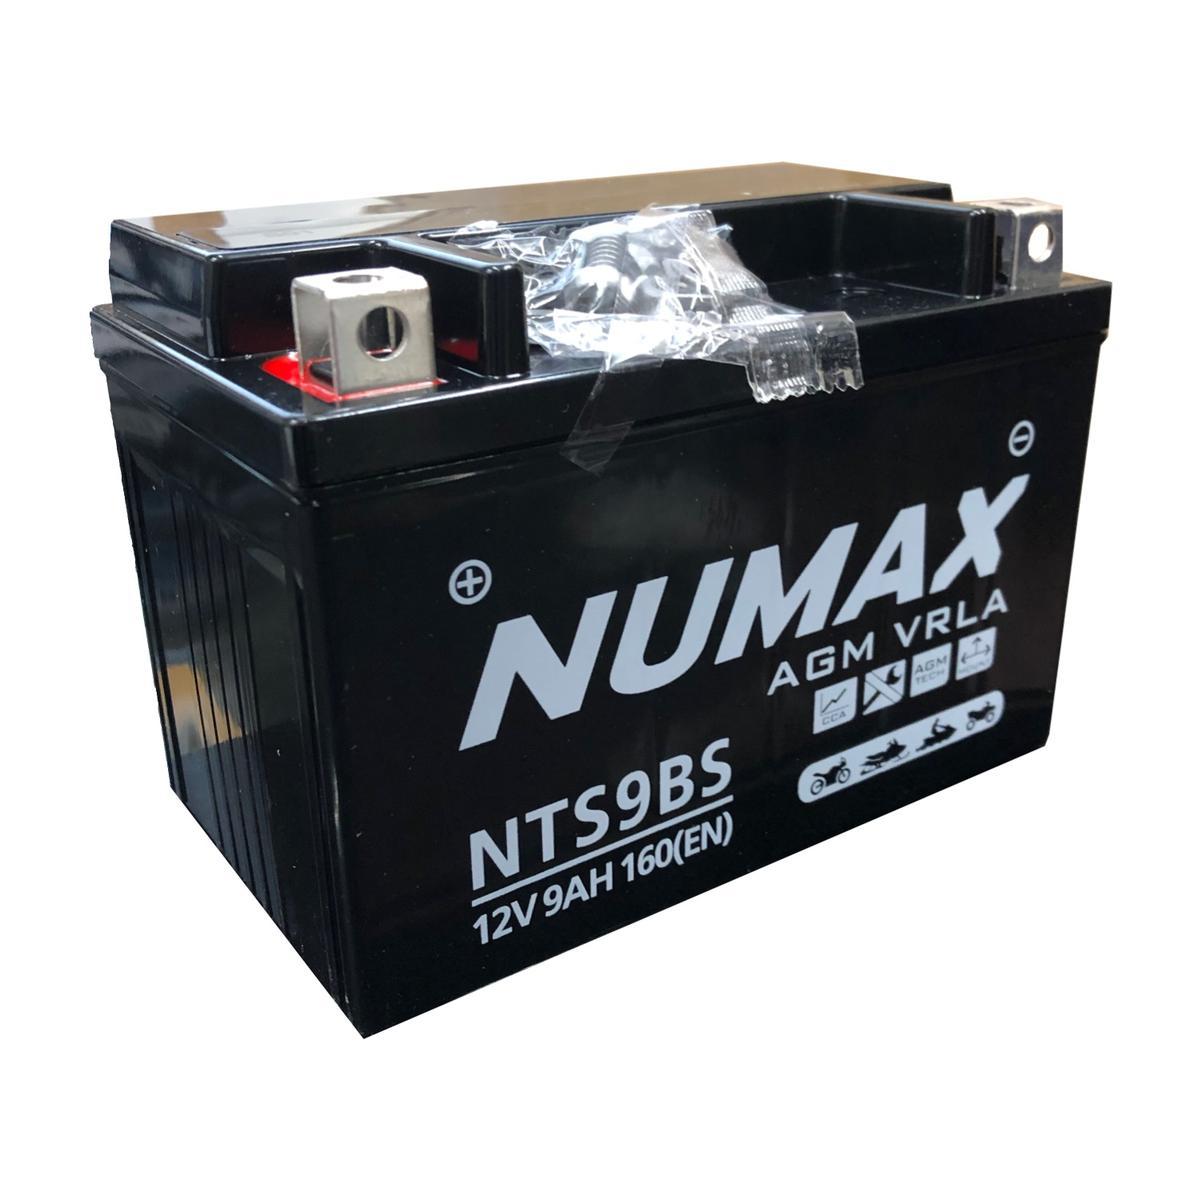 Numax NTS9BS 12v Motorbike Bike Gel Battery HONDA 600cc Hurricane YXT9-4